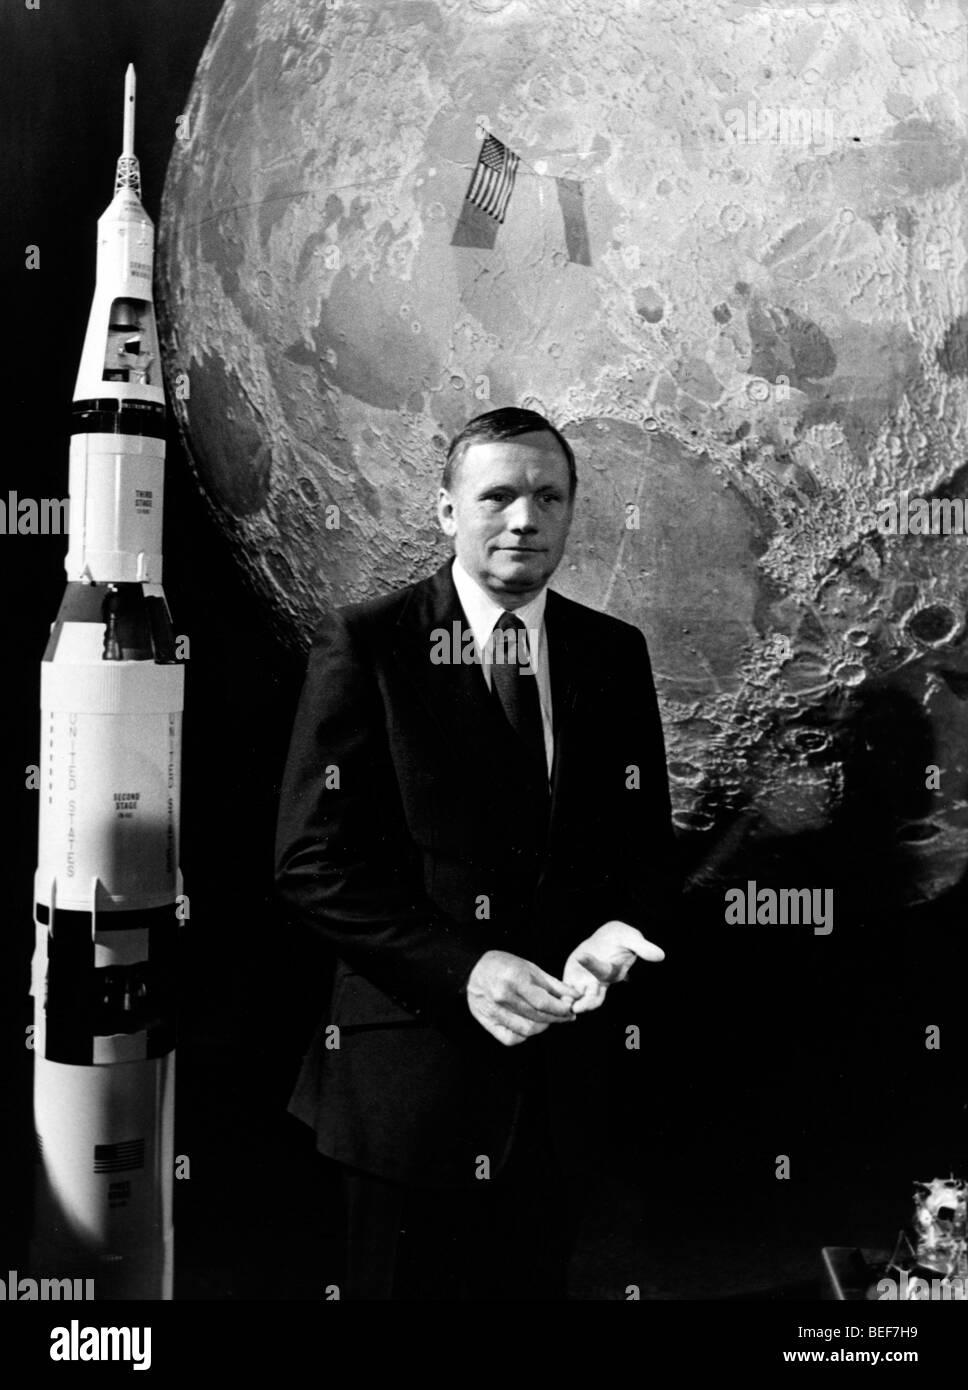 Astronaut Neil Armstrong filmt französischen TV-show Stockfoto